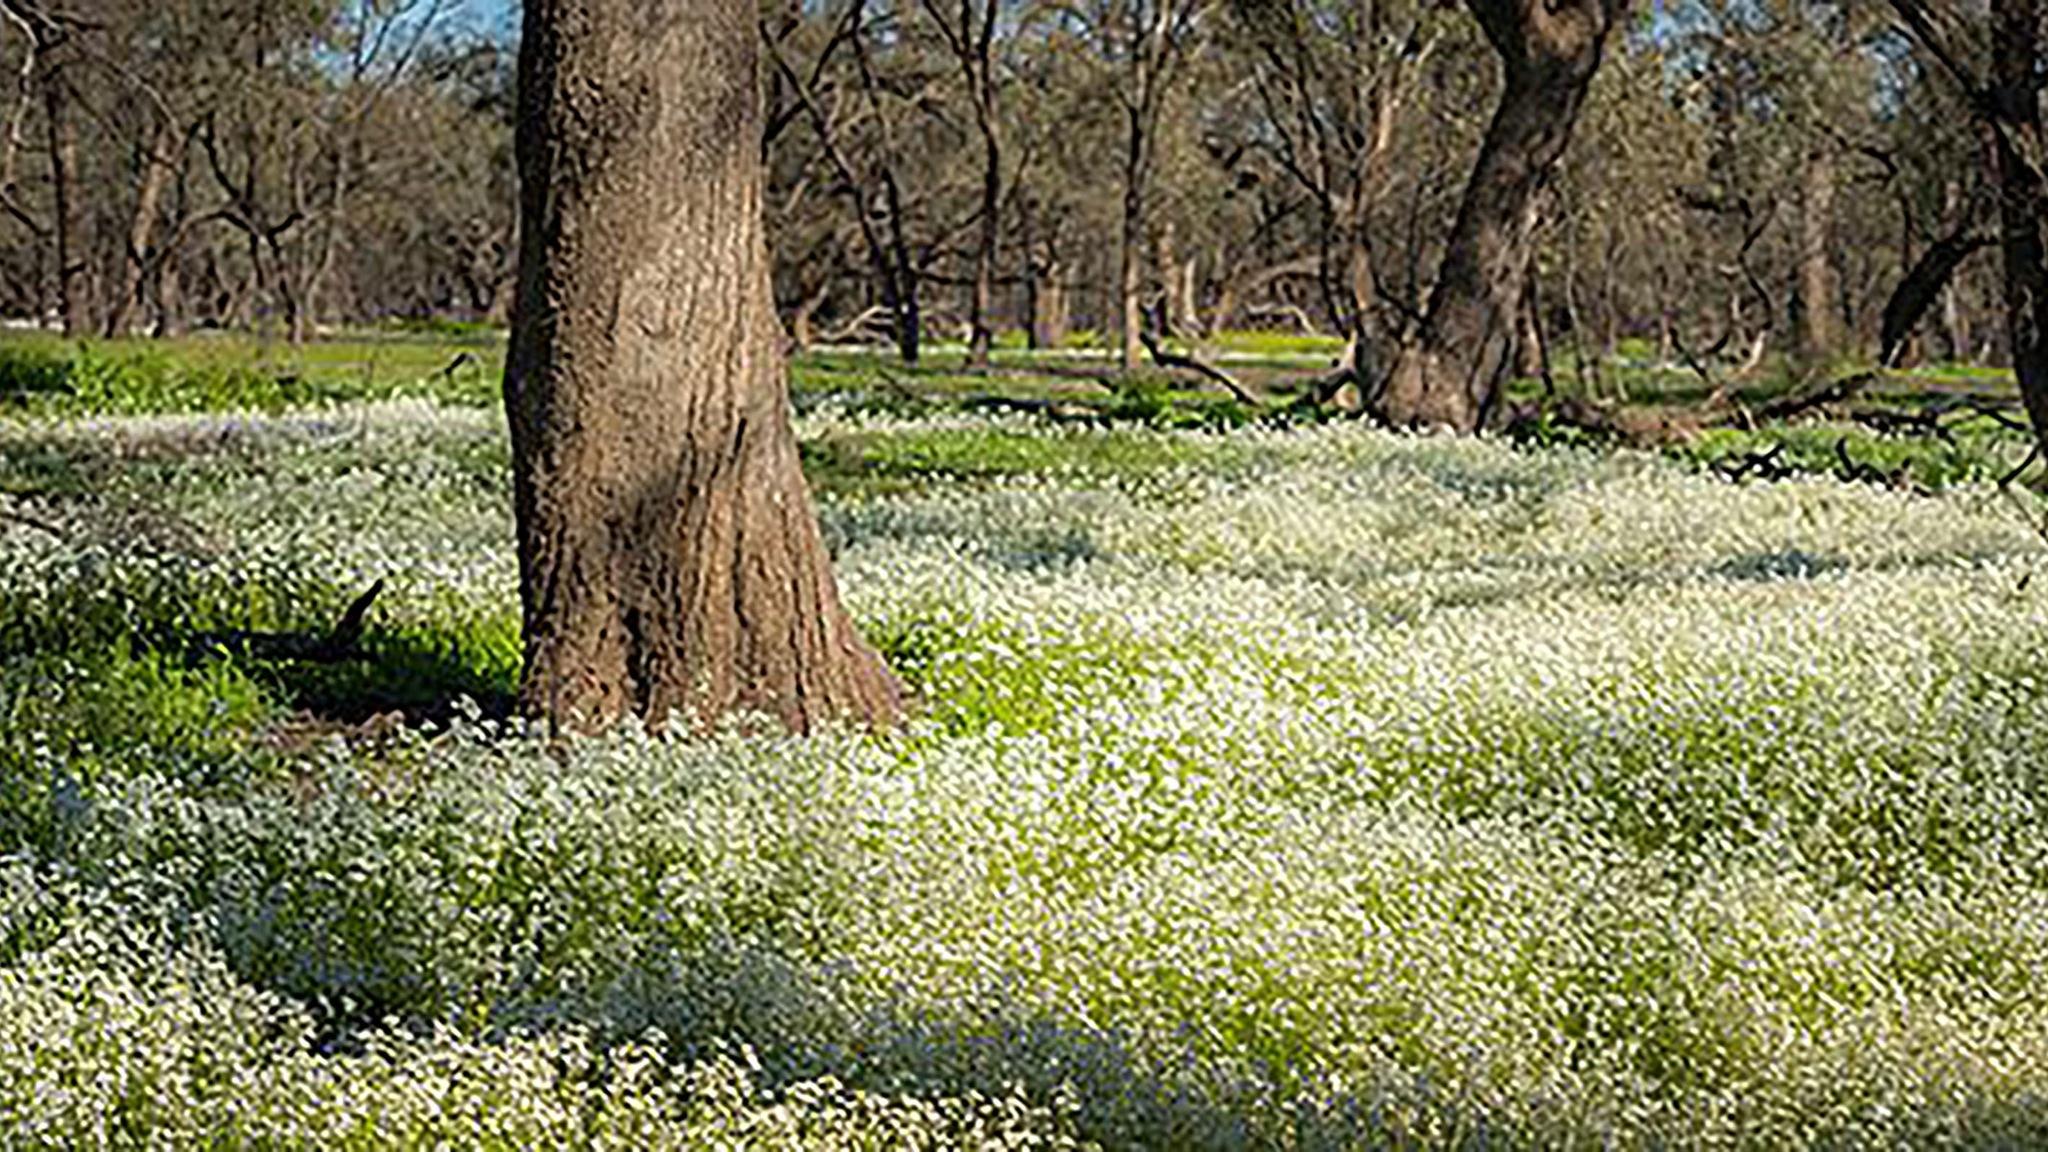 Leaghur State Park - Parks Victoria